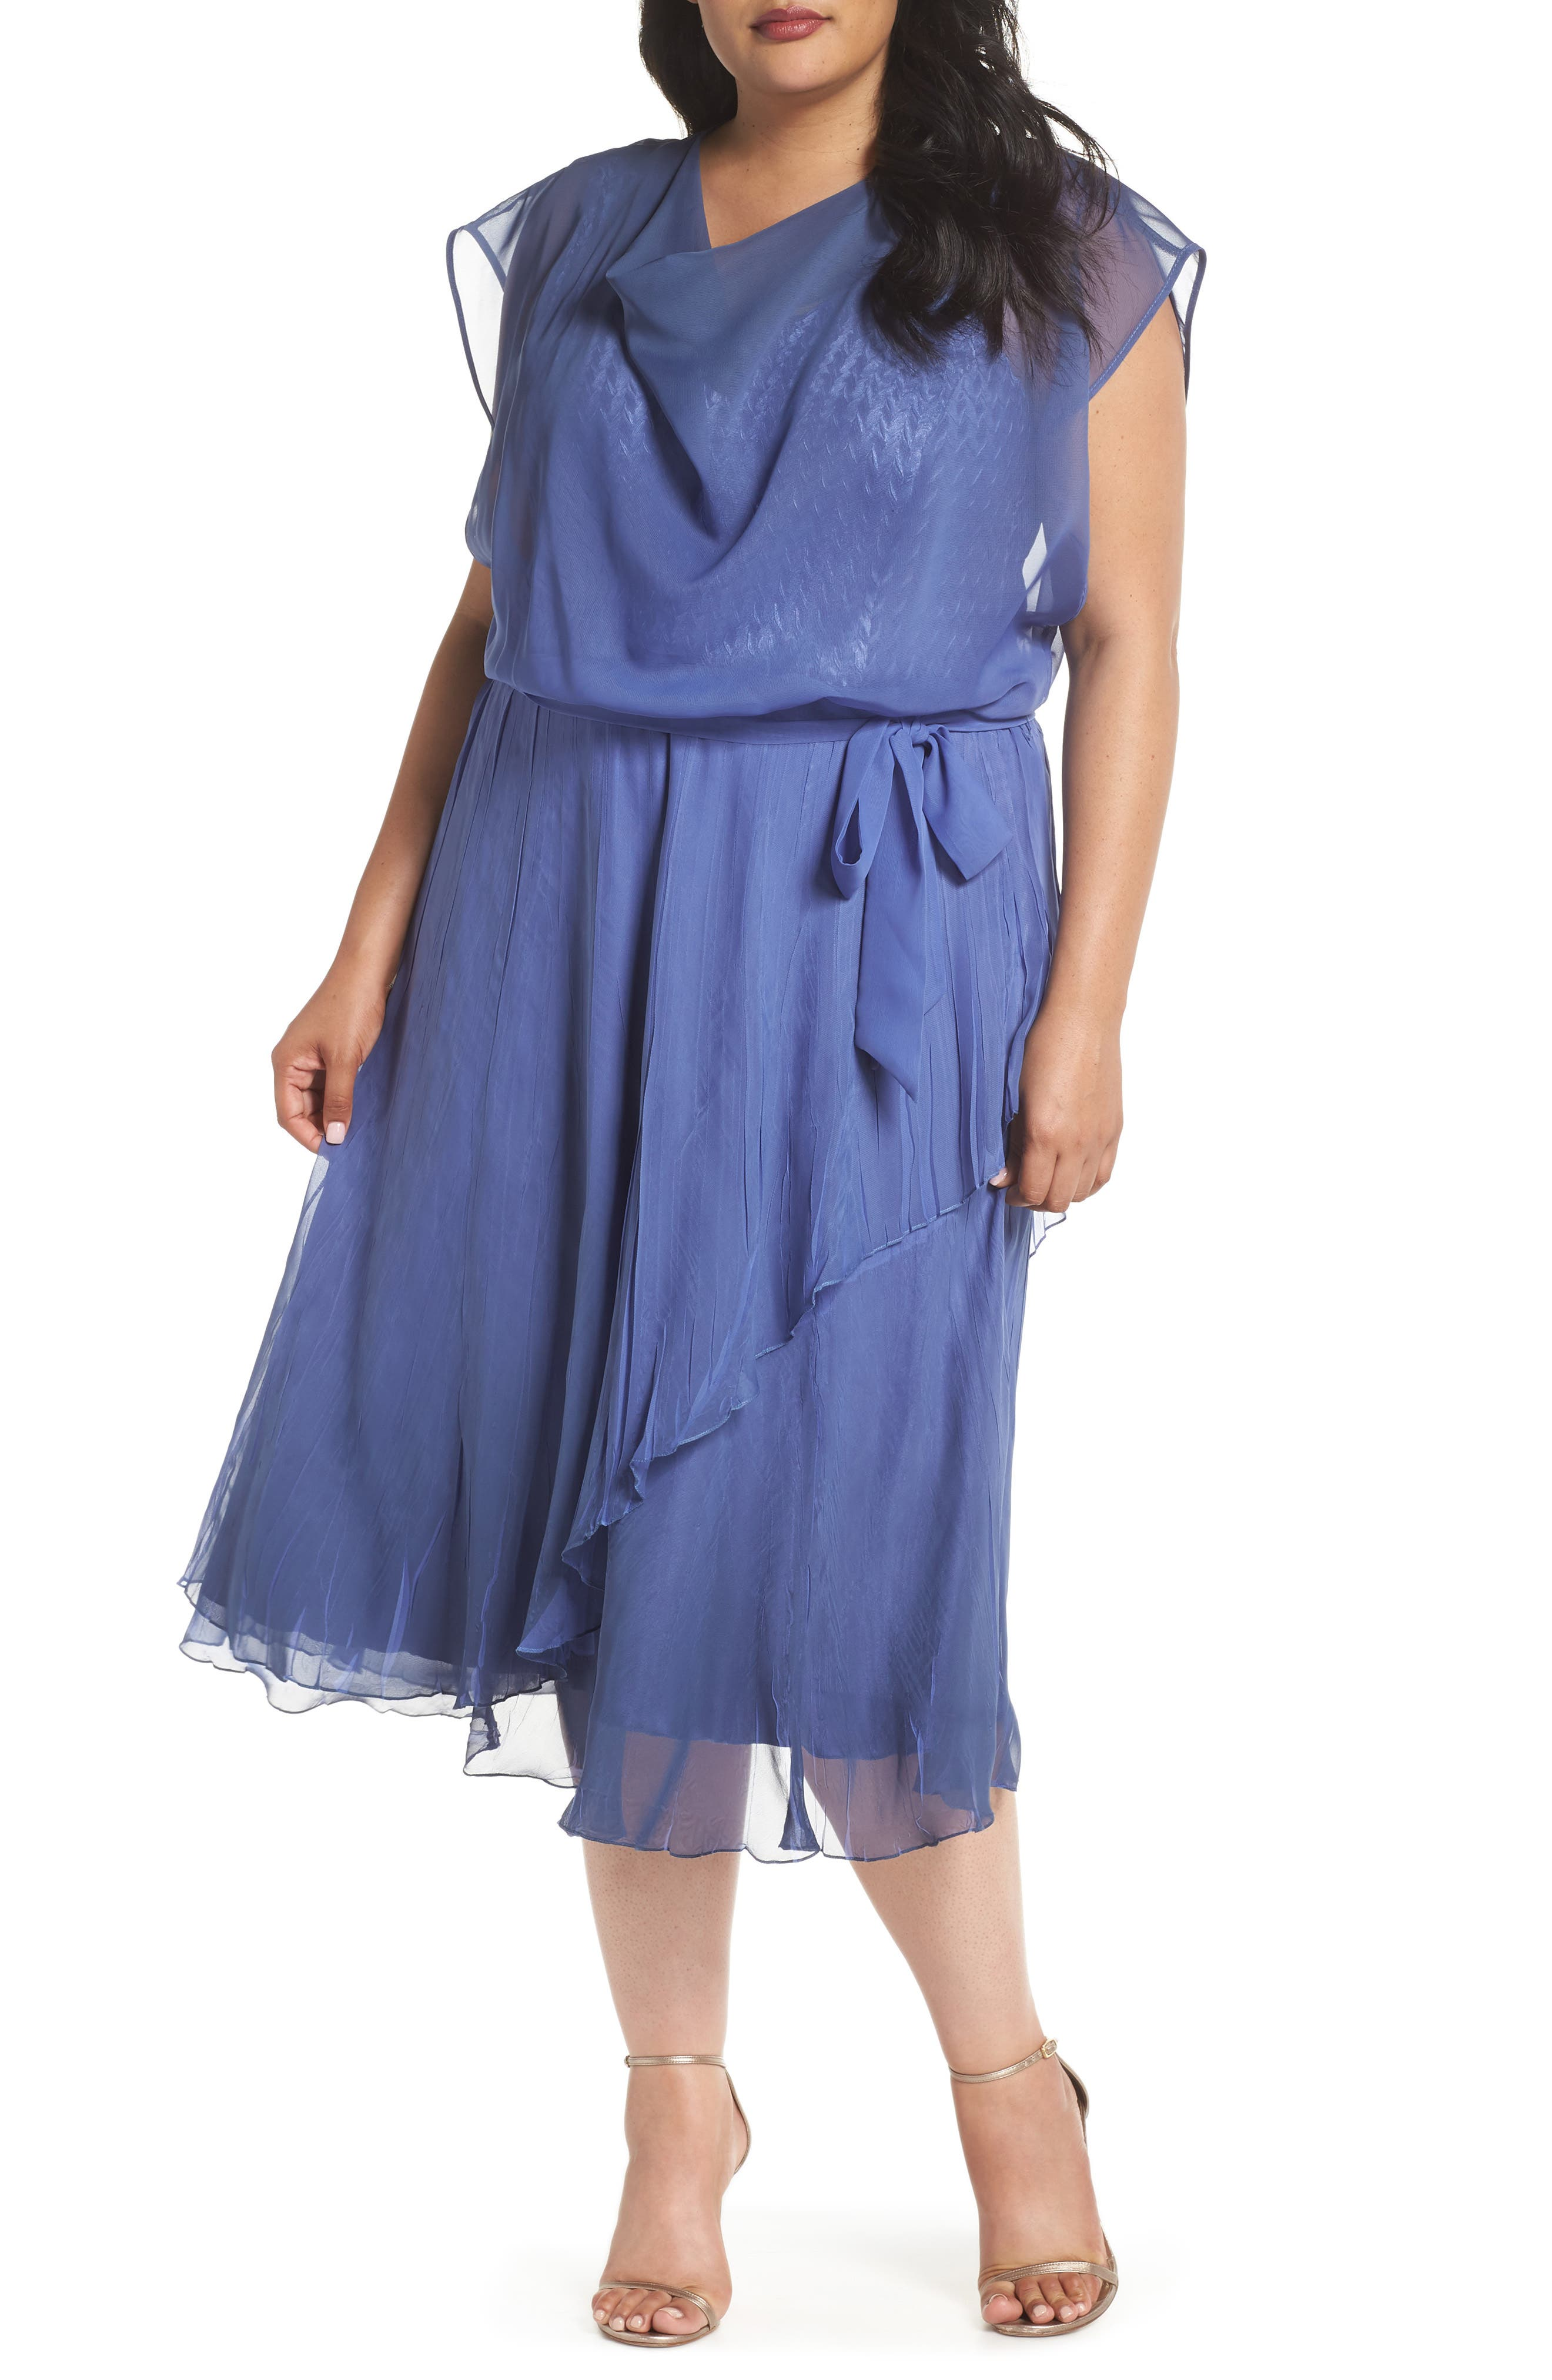 Charmeuse & Chiffon Blouson Dress,                             Main thumbnail 1, color,                             Fregatta Blue Ombre